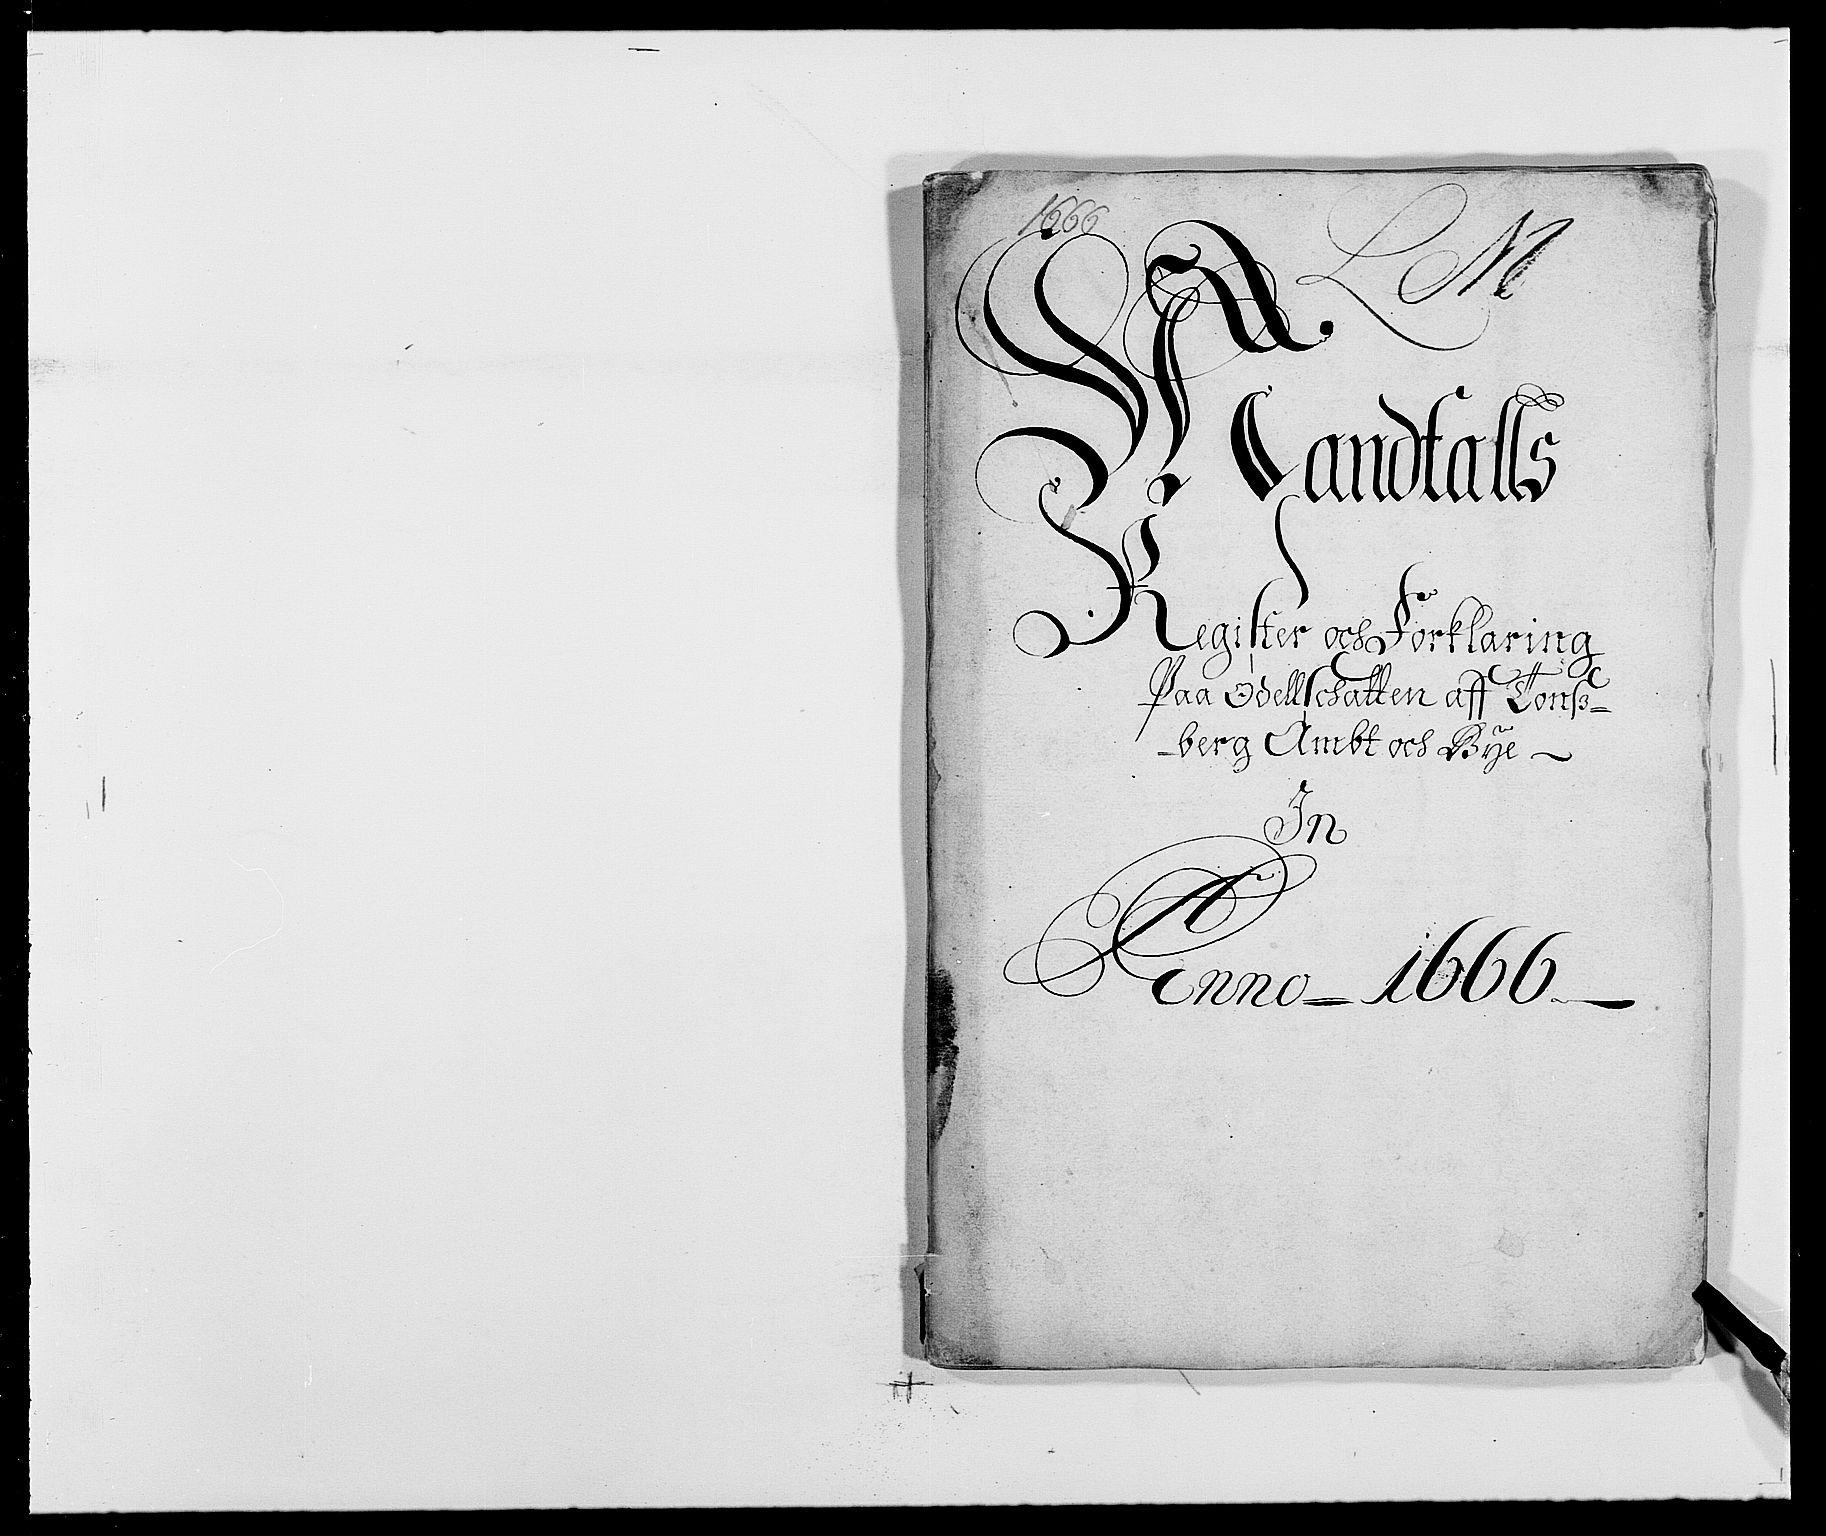 RA, Rentekammeret inntil 1814, Reviderte regnskaper, Fogderegnskap, R32/L1840: Fogderegnskap Jarlsberg grevskap, 1664-1673, s. 1